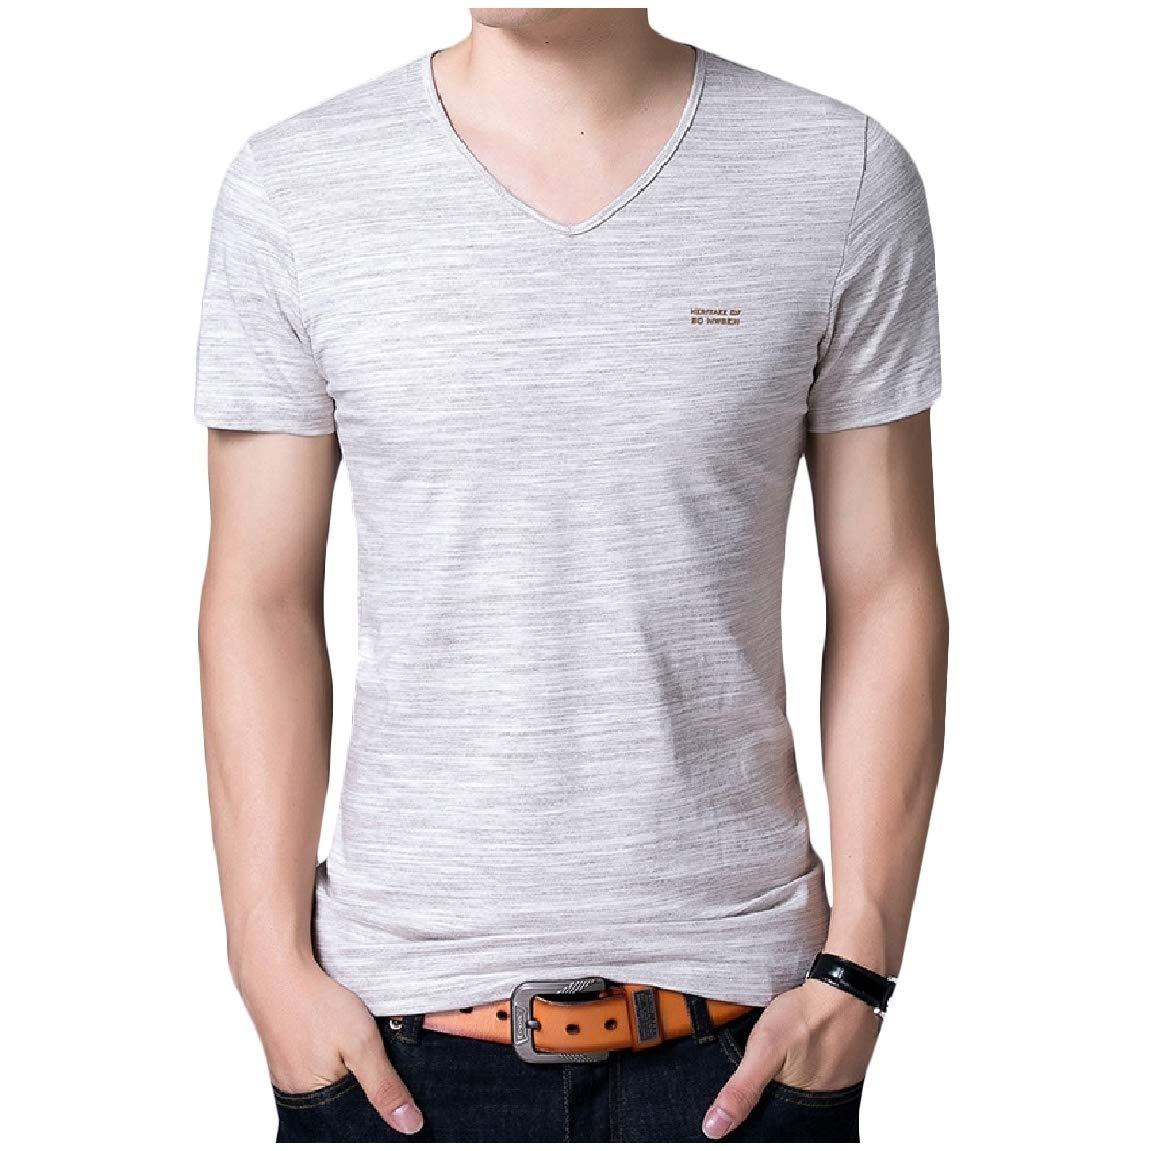 Mirrliy Mens Plus Size V-Neck Pullover Lounge Slim Short-Sleeve T-Shirt